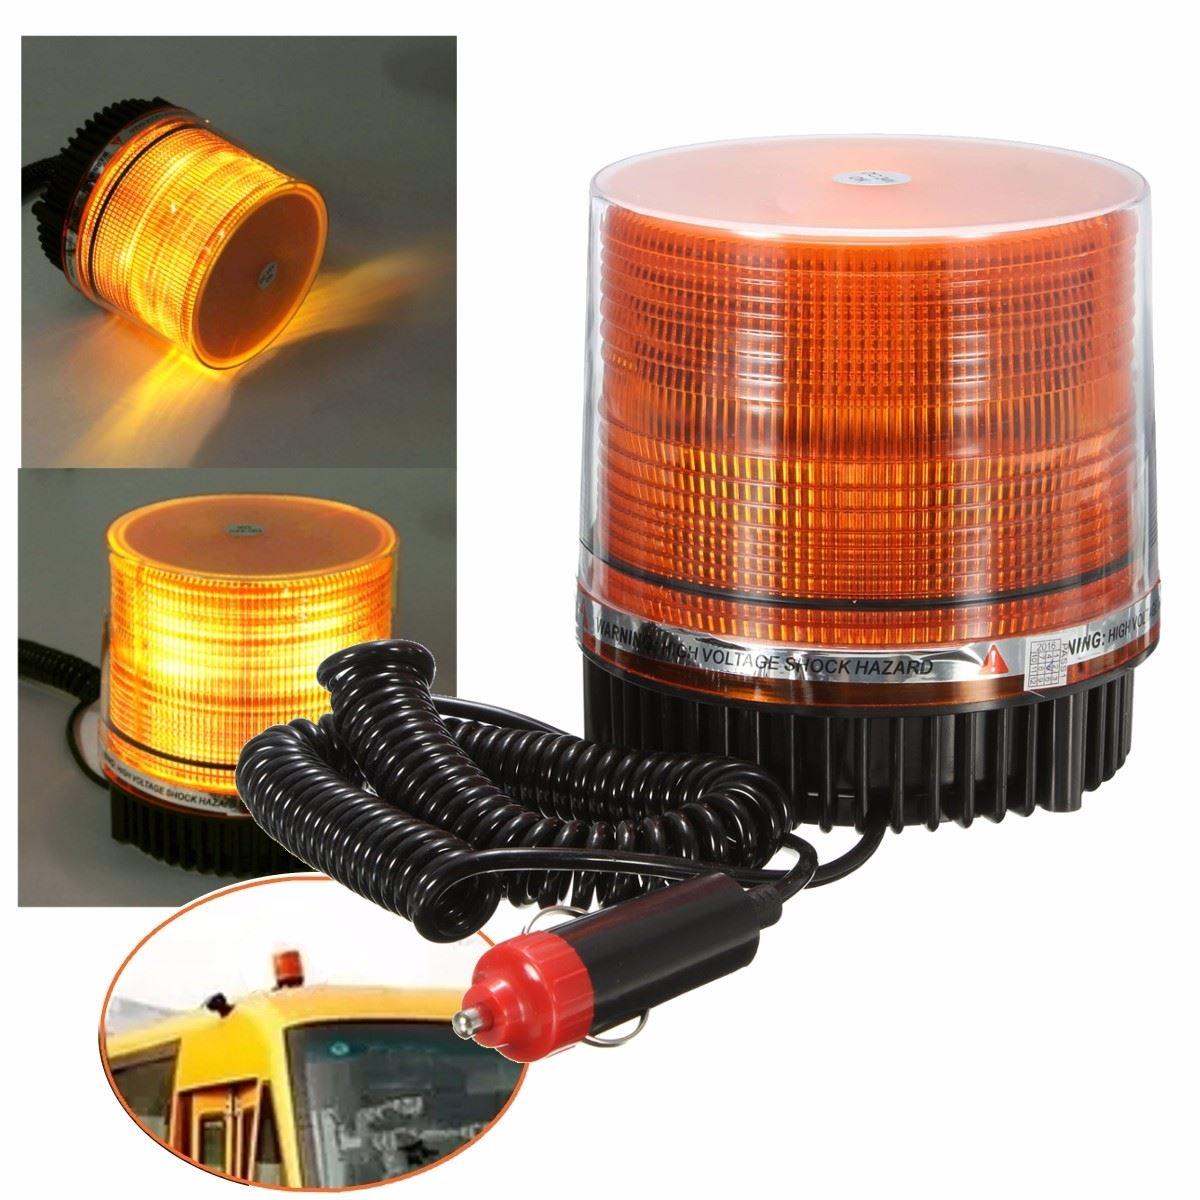 New DC12V LED Amber Car Truck Magnetic Mounted Vehicle Emergency Beacon Emergency Strobe Flashing Lamp<br><br>Aliexpress